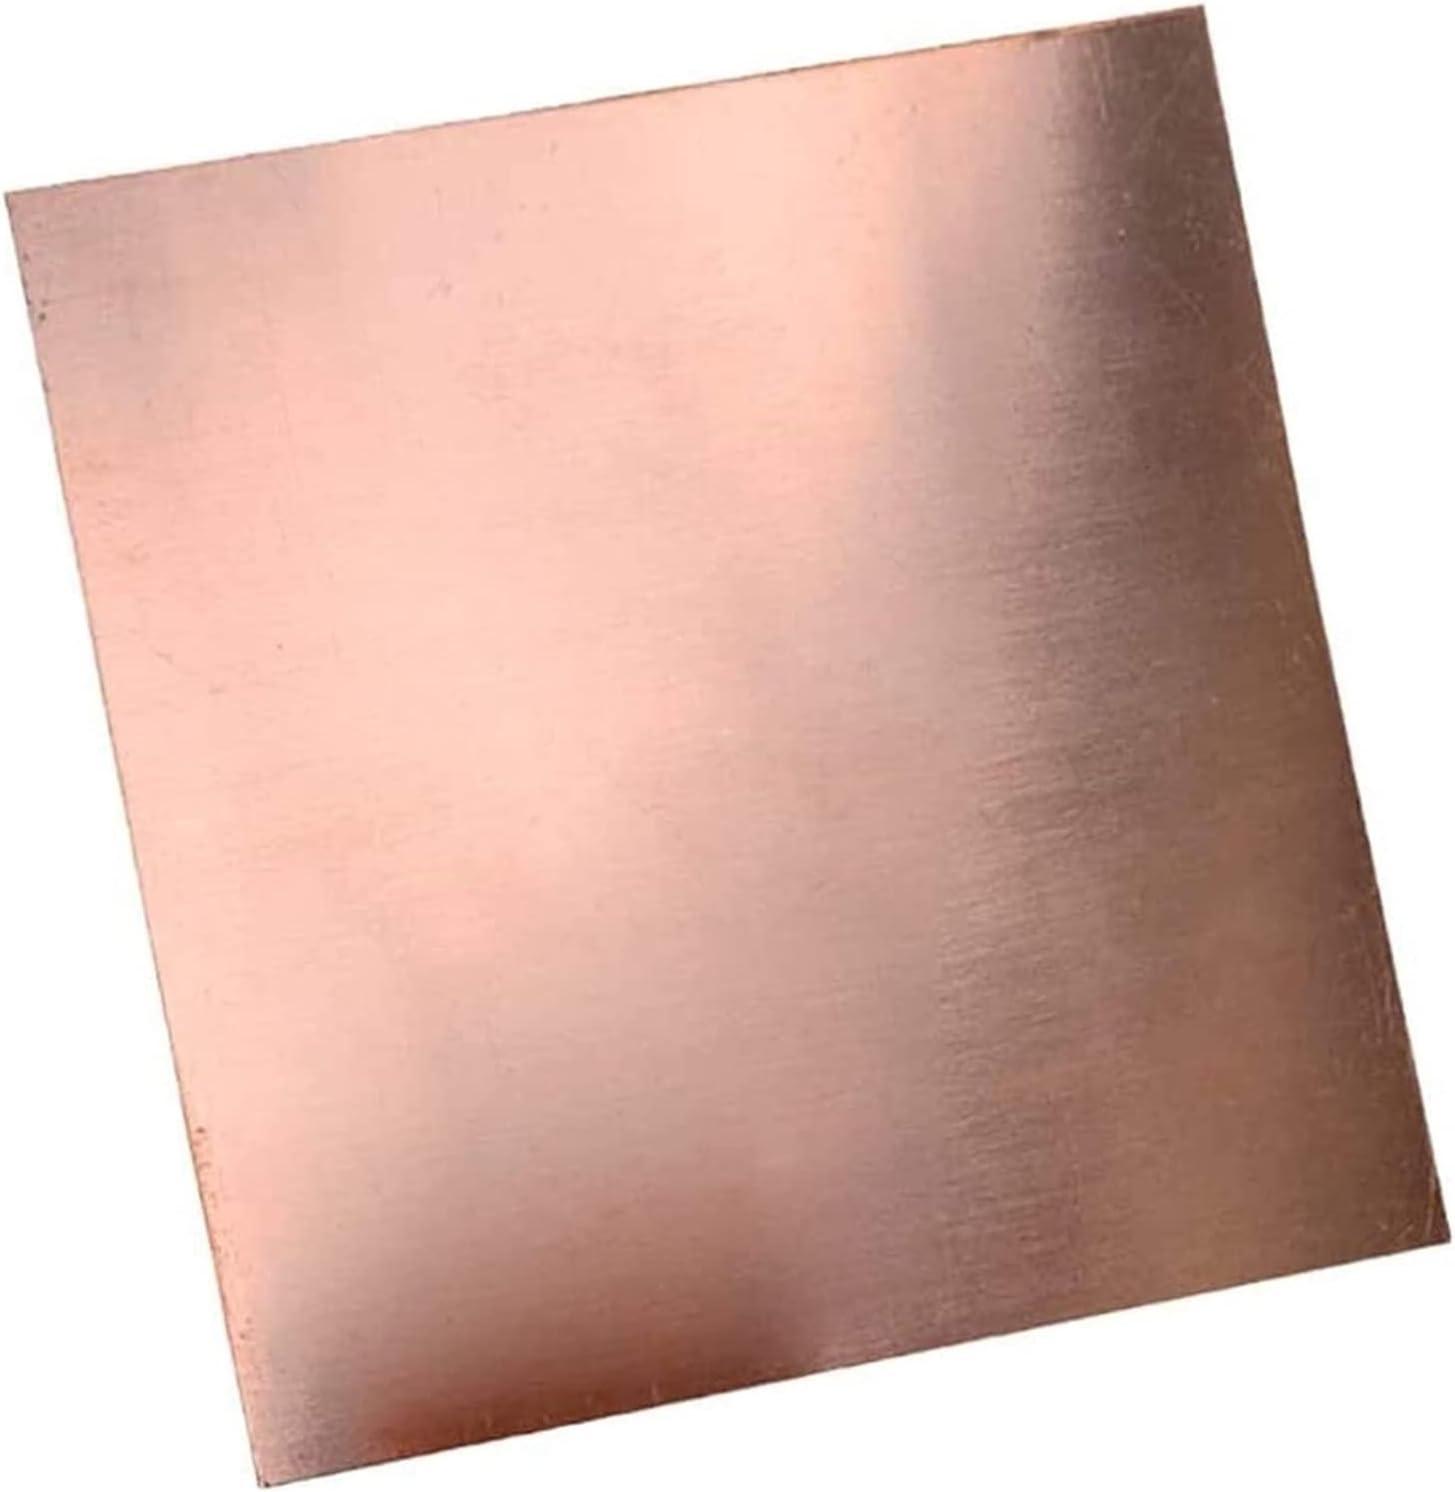 lovediyxihe Metal Max 60% OFF Copper foil Shee Pure Tulsa Mall Sheet